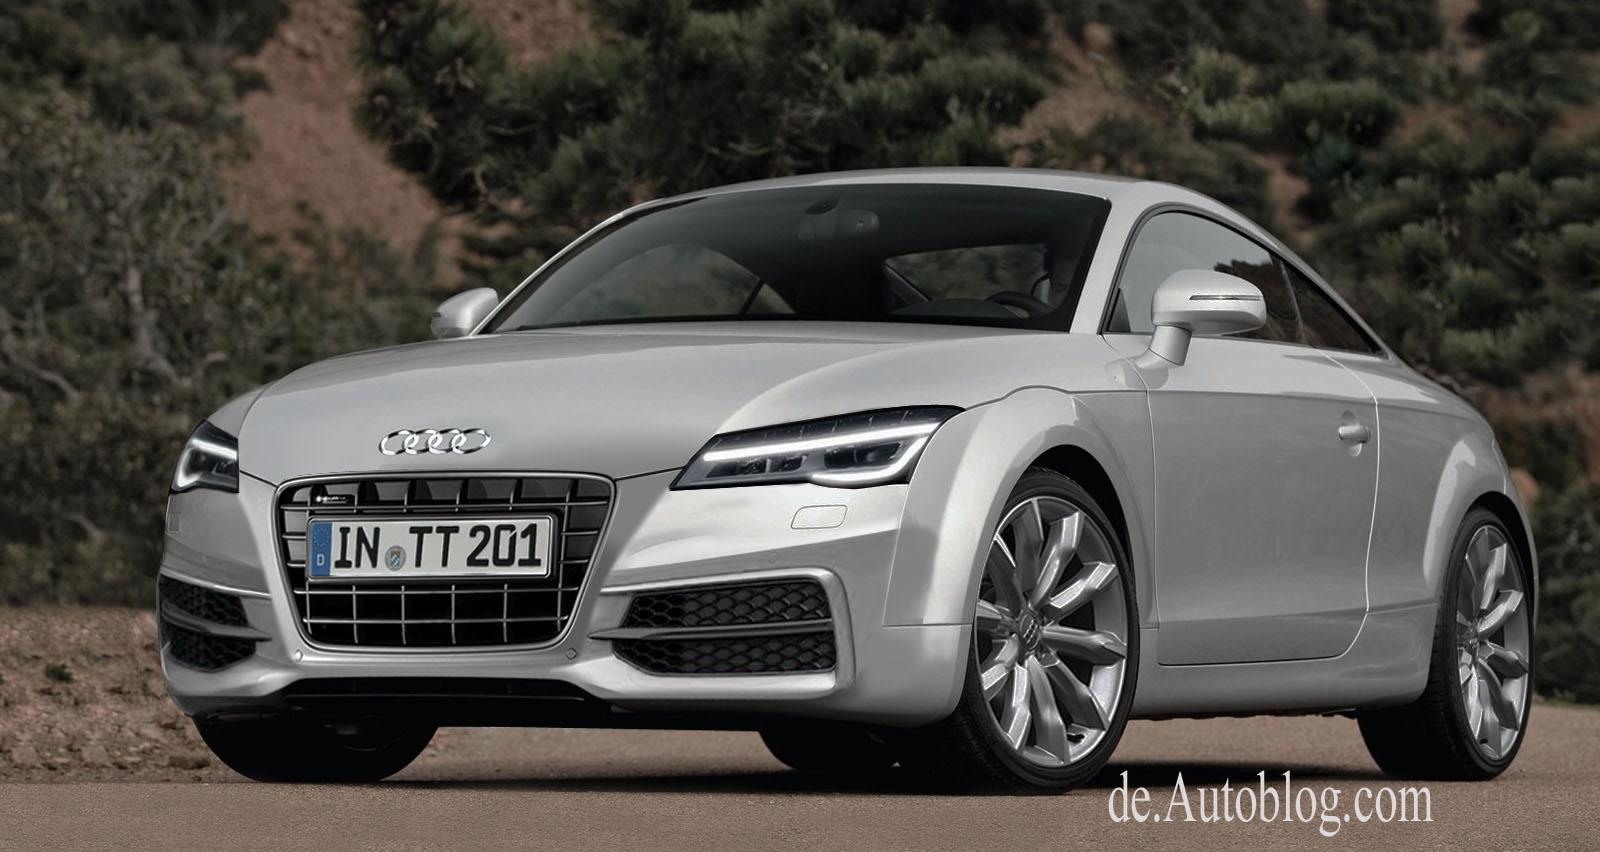 Audi TT 2014 Photo - 1